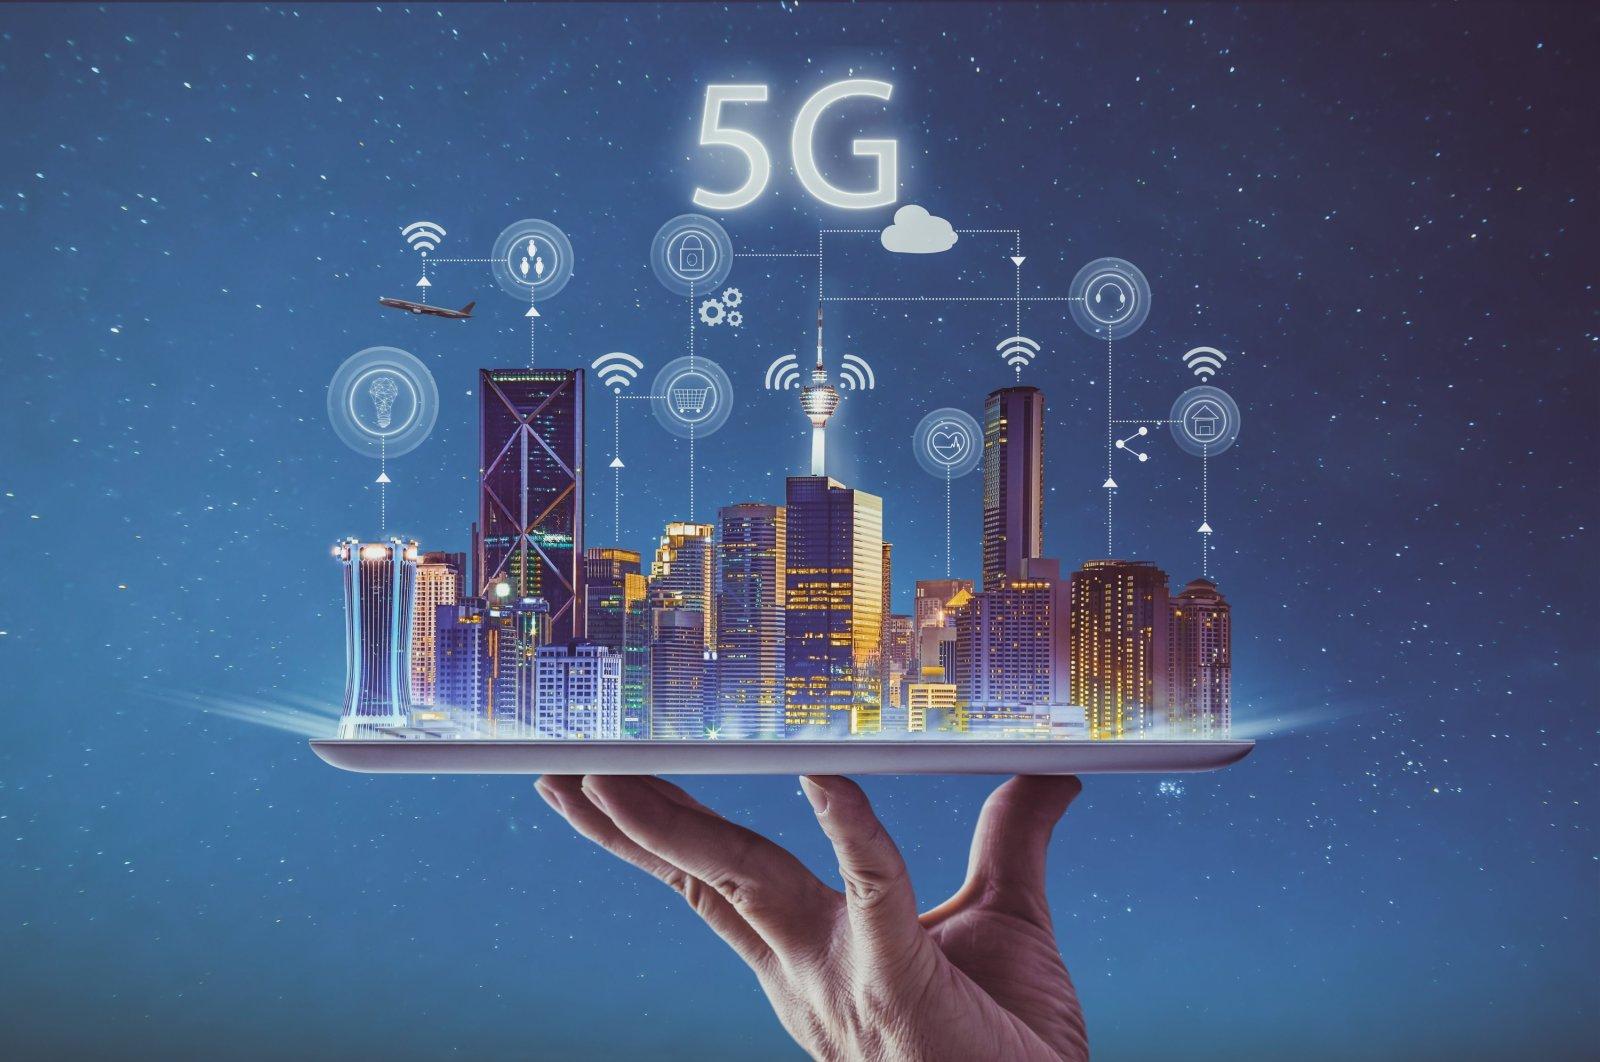 Türk Telekom reaches speeds over 4.5 Gbps in its 5G network test. (iStock Photo)